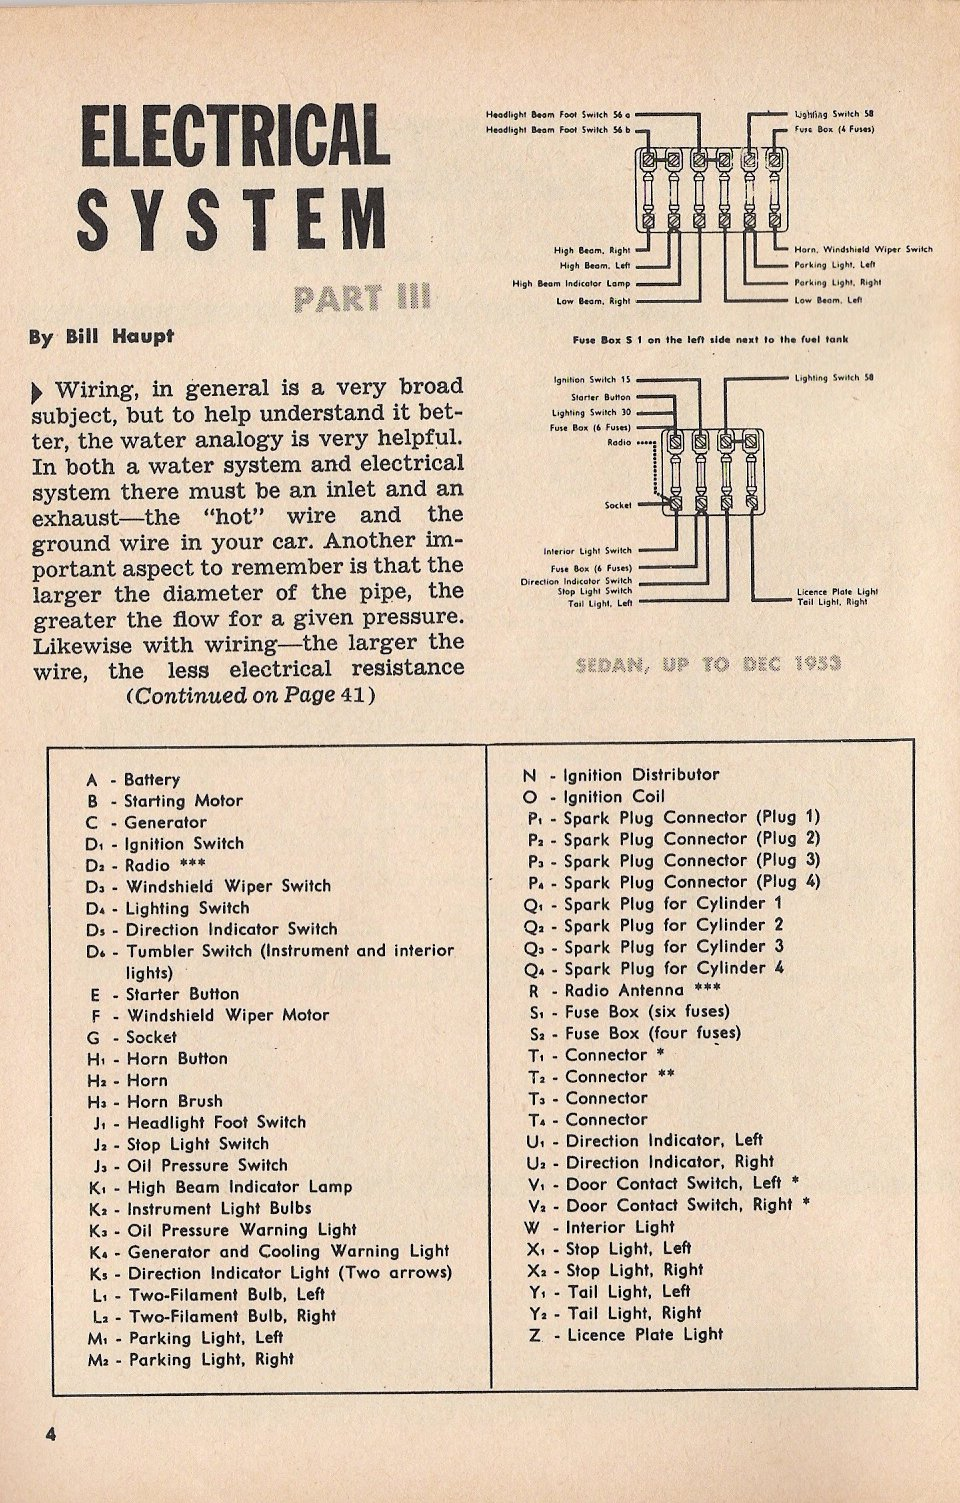 1965 Vw Karmann Ghia Diagram – Karmann Ghias For Wiring Diagrams